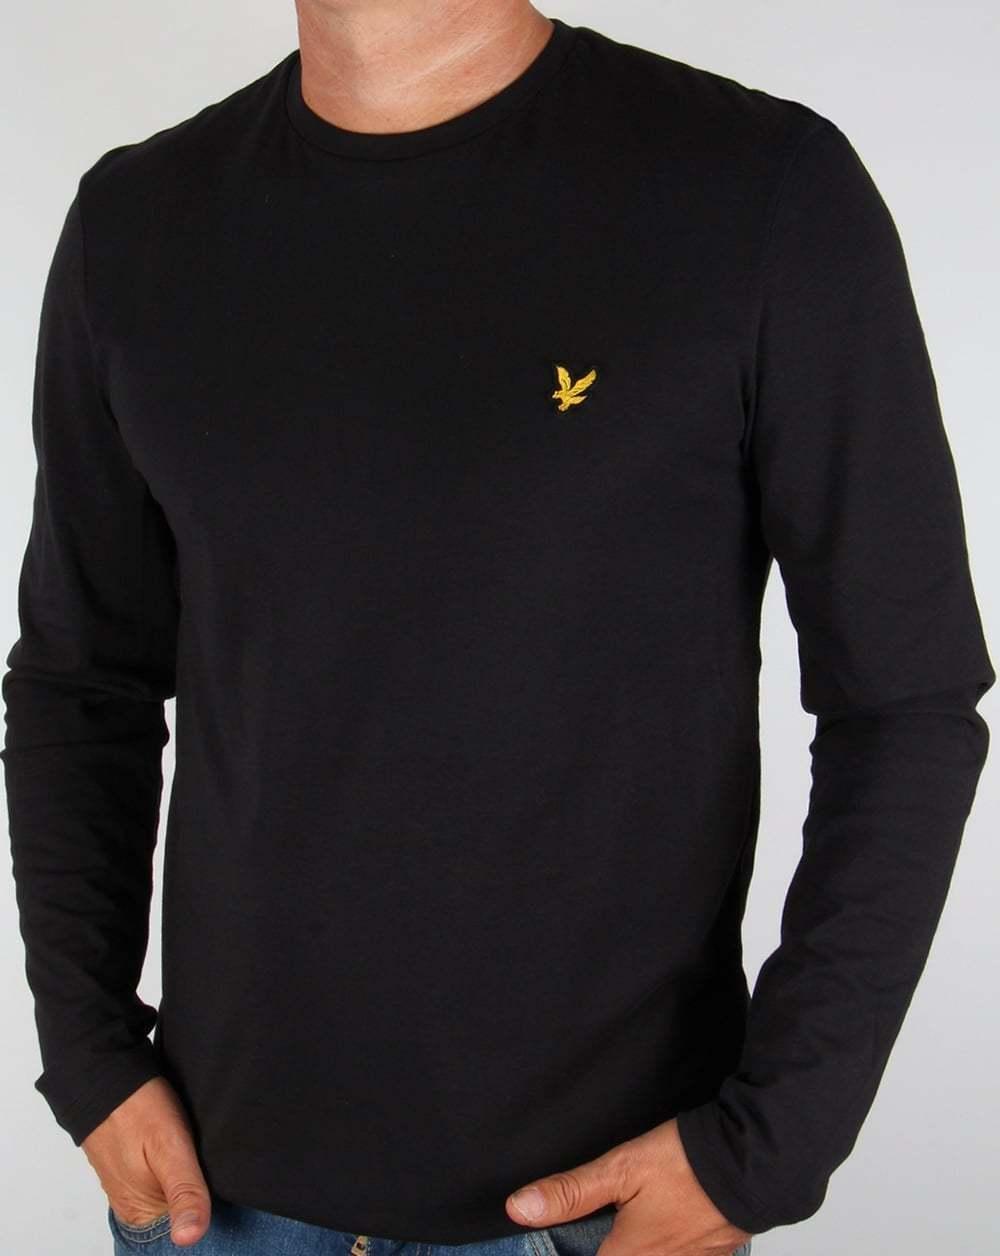 Lyle and Scott Manica Lunga T-Shirt in Nero - 100% COTONE GIROCOLLO